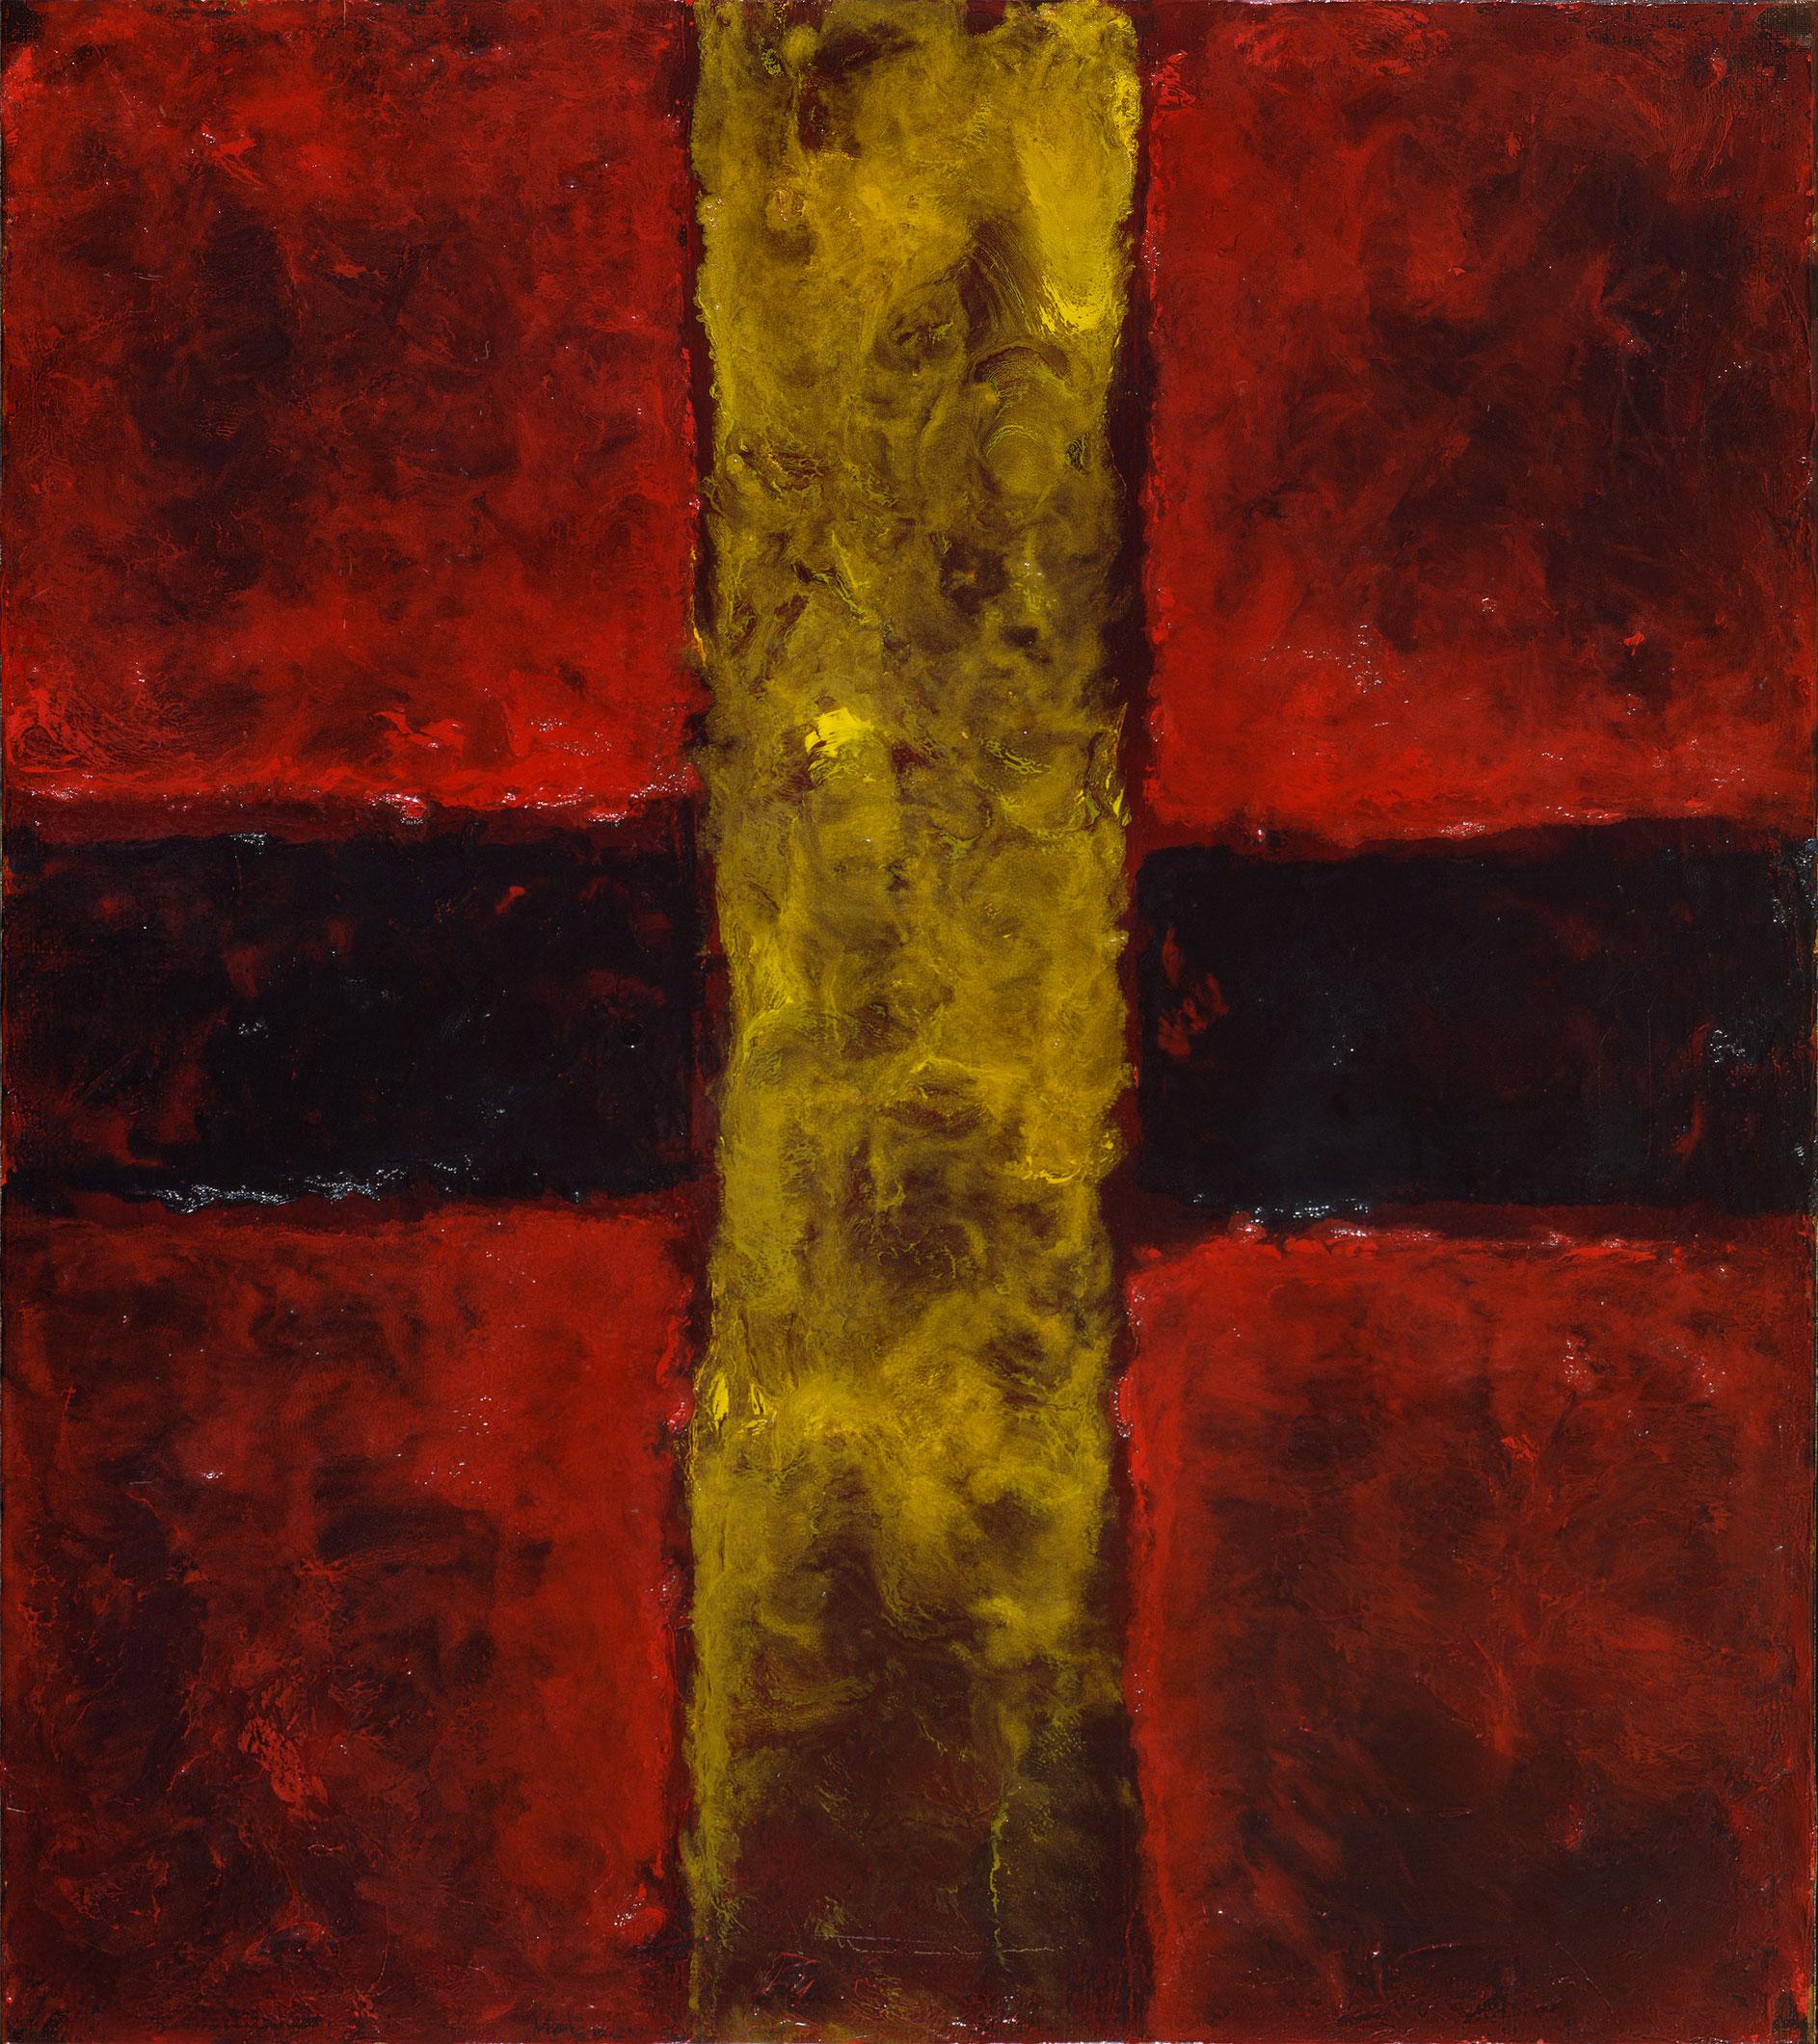 Drapeau inconnu, 1963, Jean McEwen, Huile sur toile.